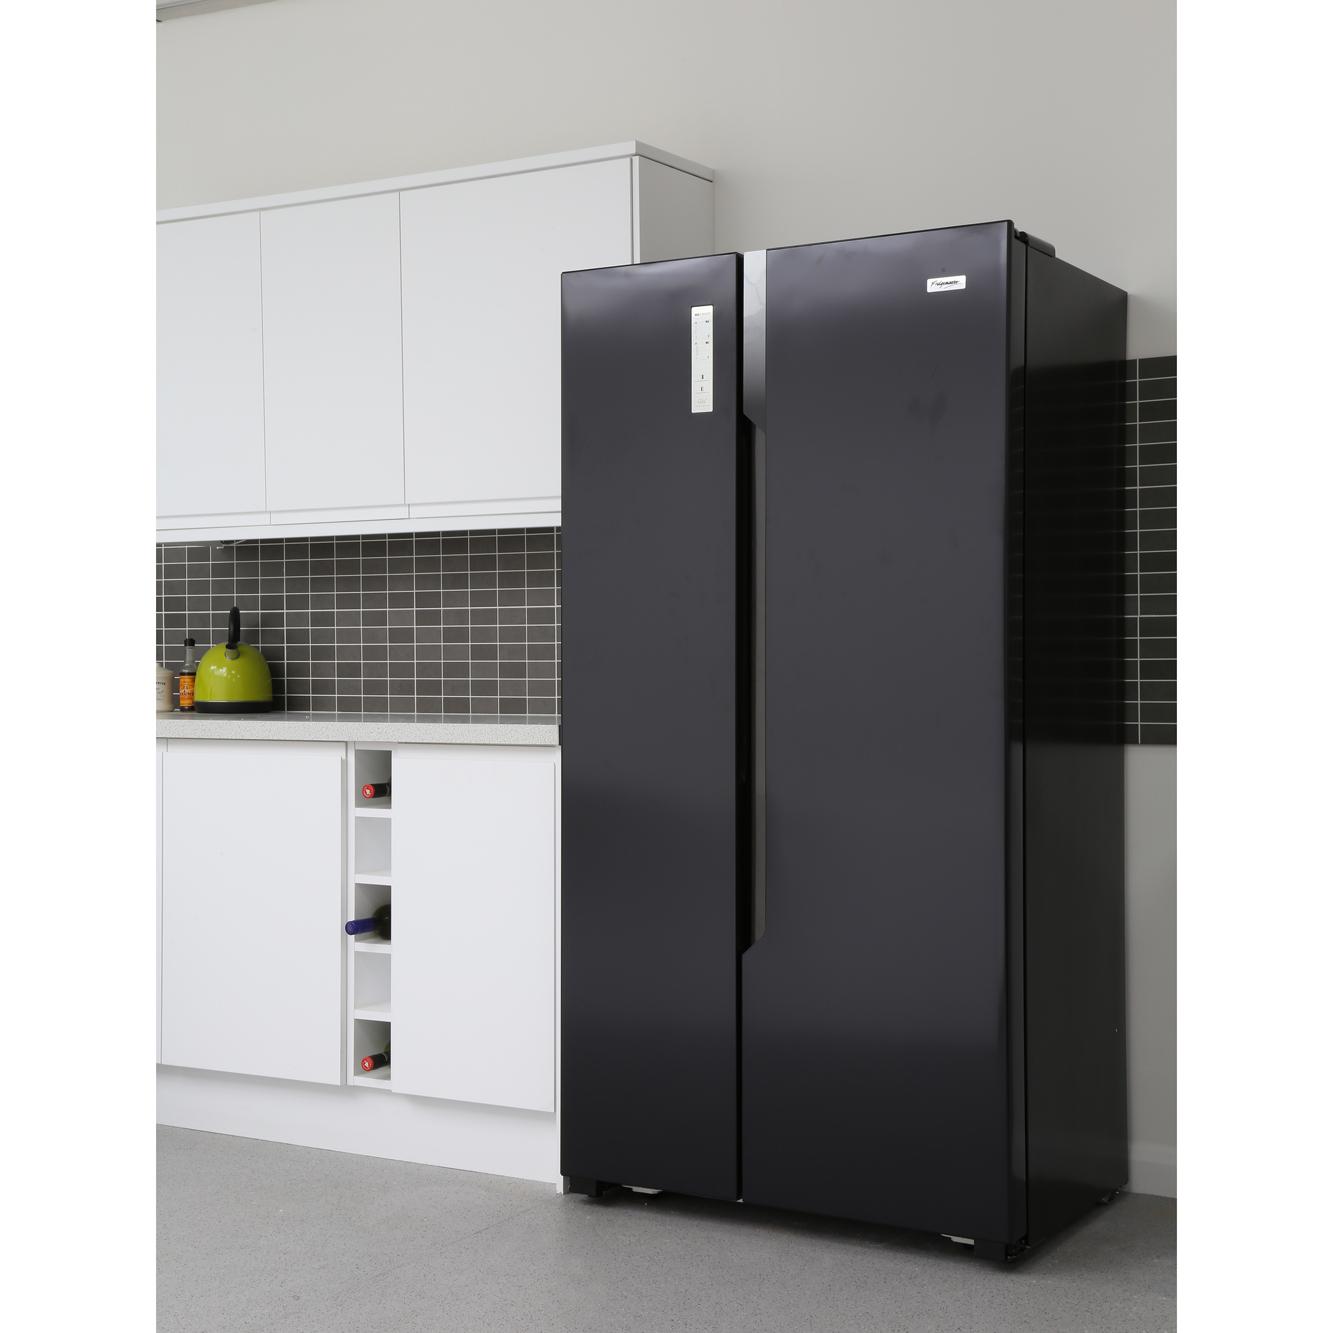 Buy Fridgemaster Ms91518ffb American Fridge Freezer